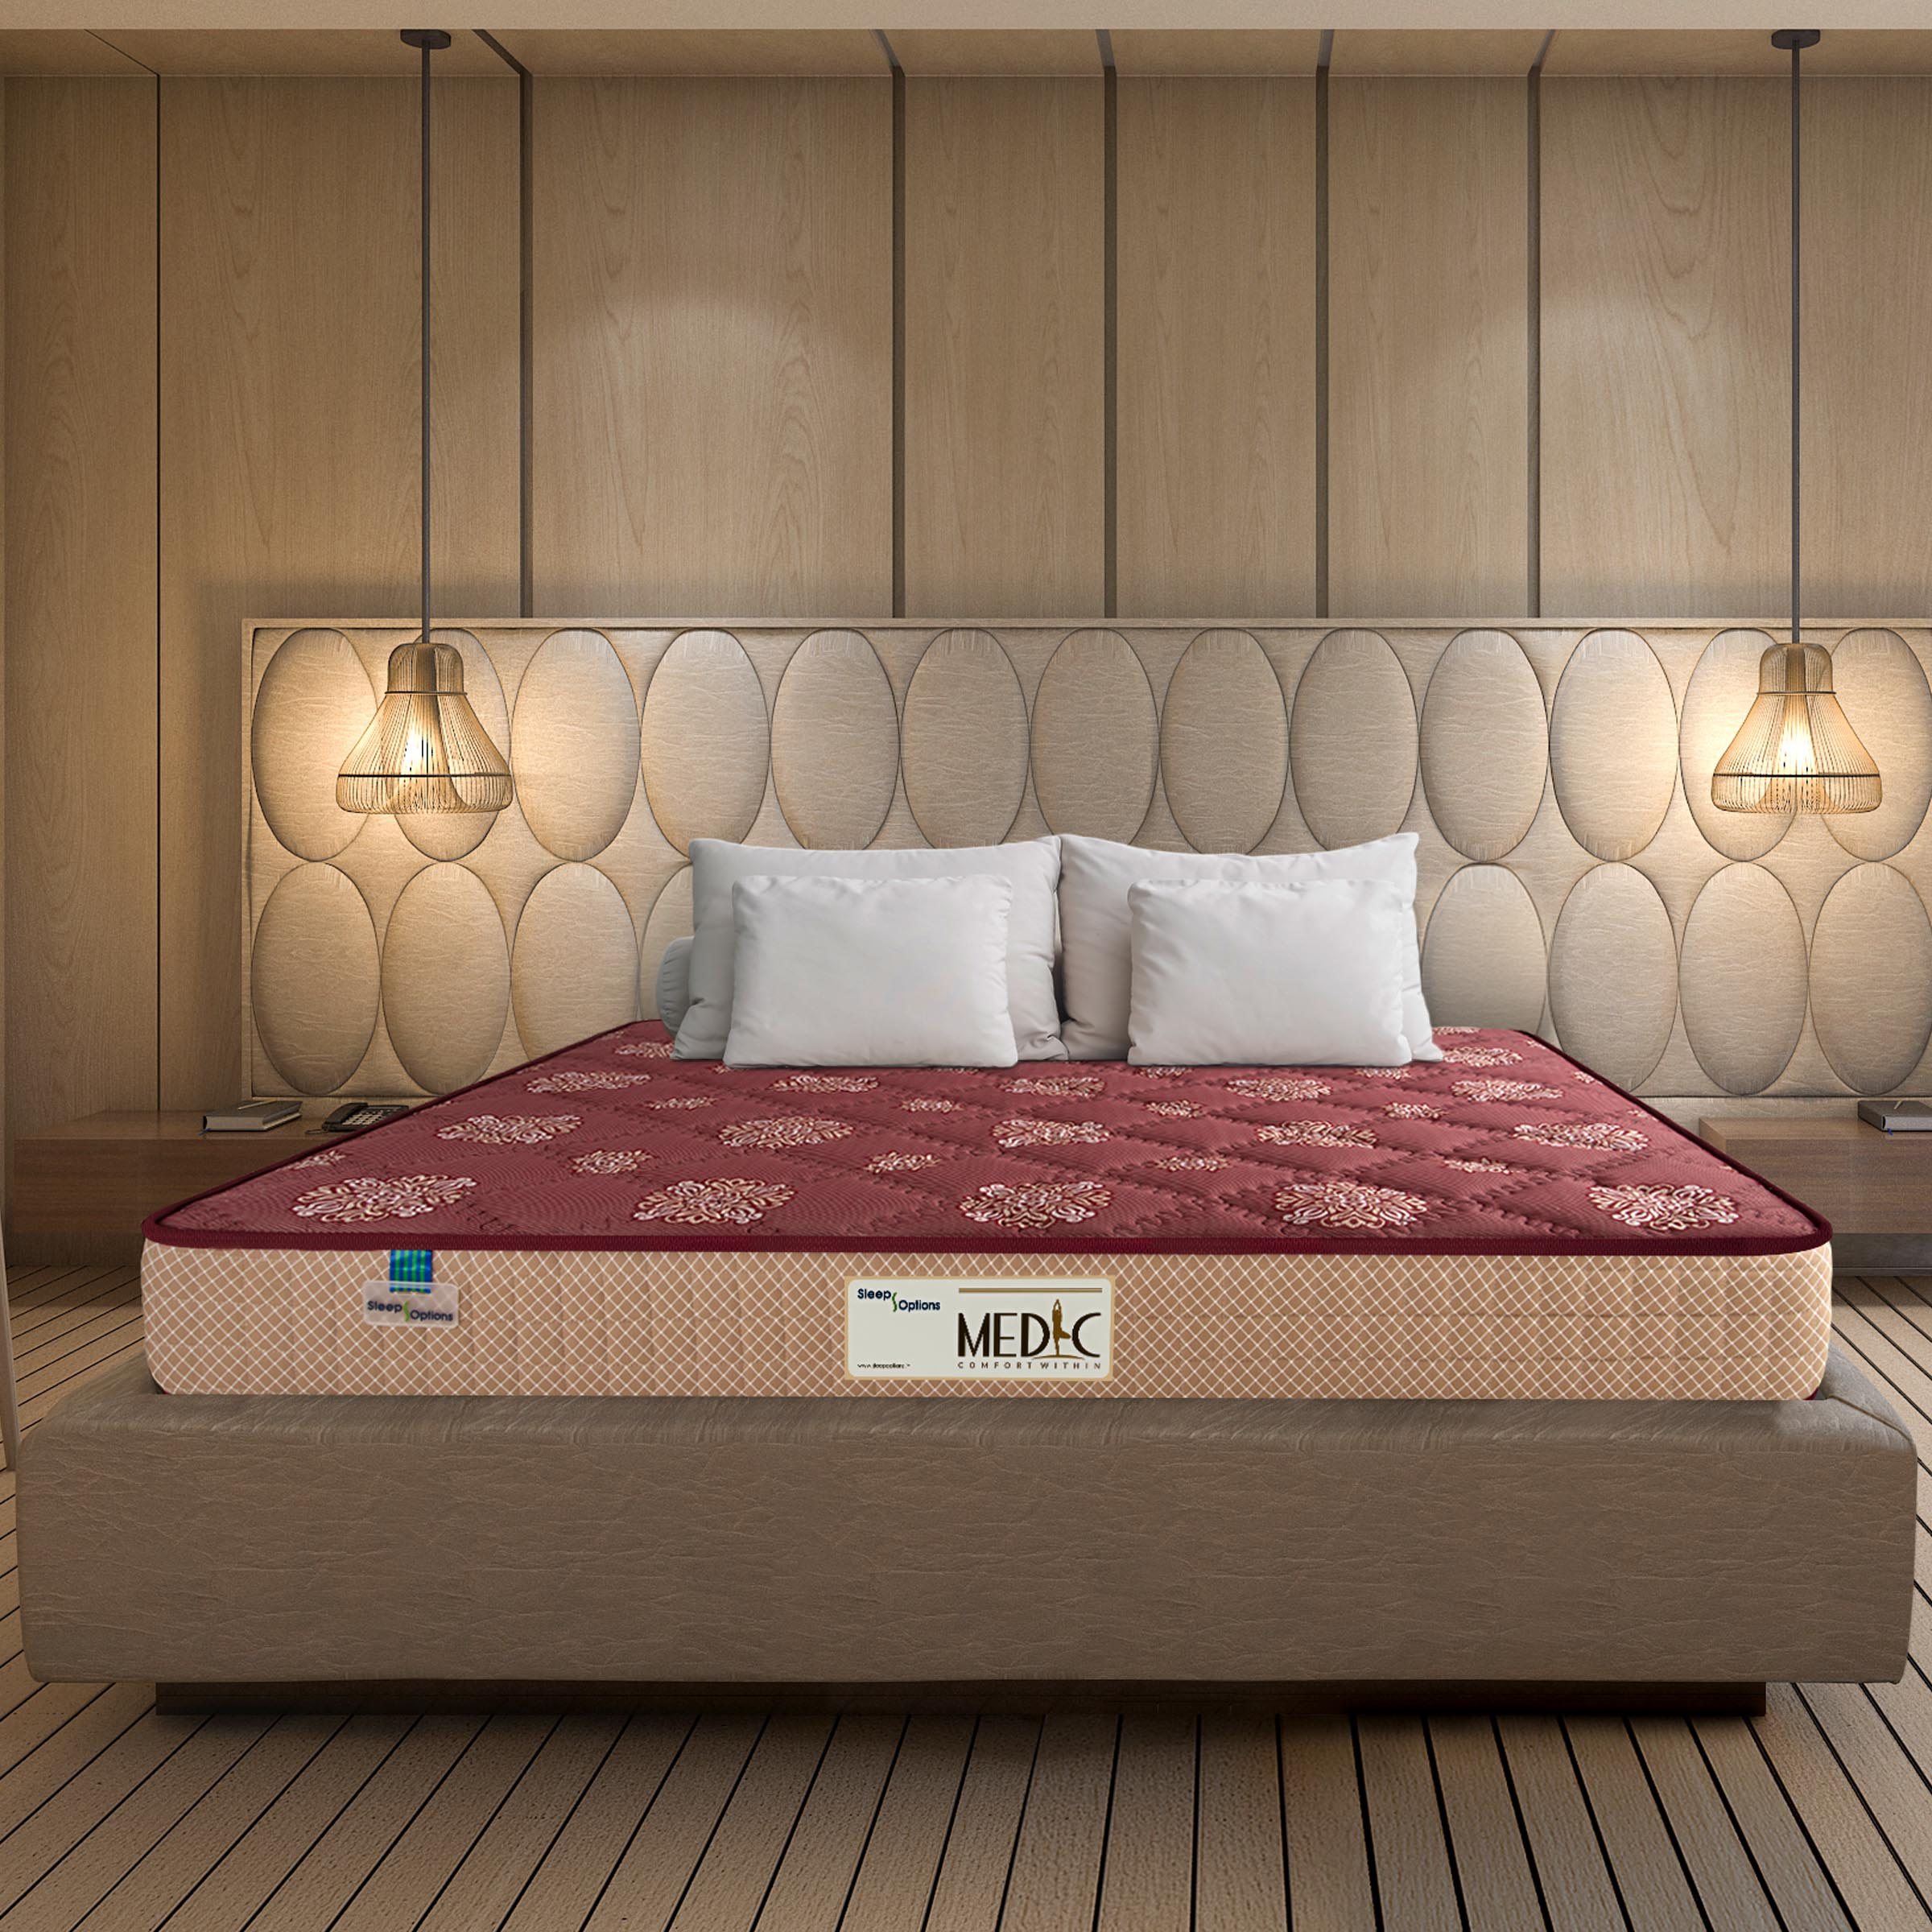 Sleep Options Medic  Orthopedic Medium Firm Normal Top 6 Inch Bonnell Spring Mattress  72x30x6 Inch,Single Size